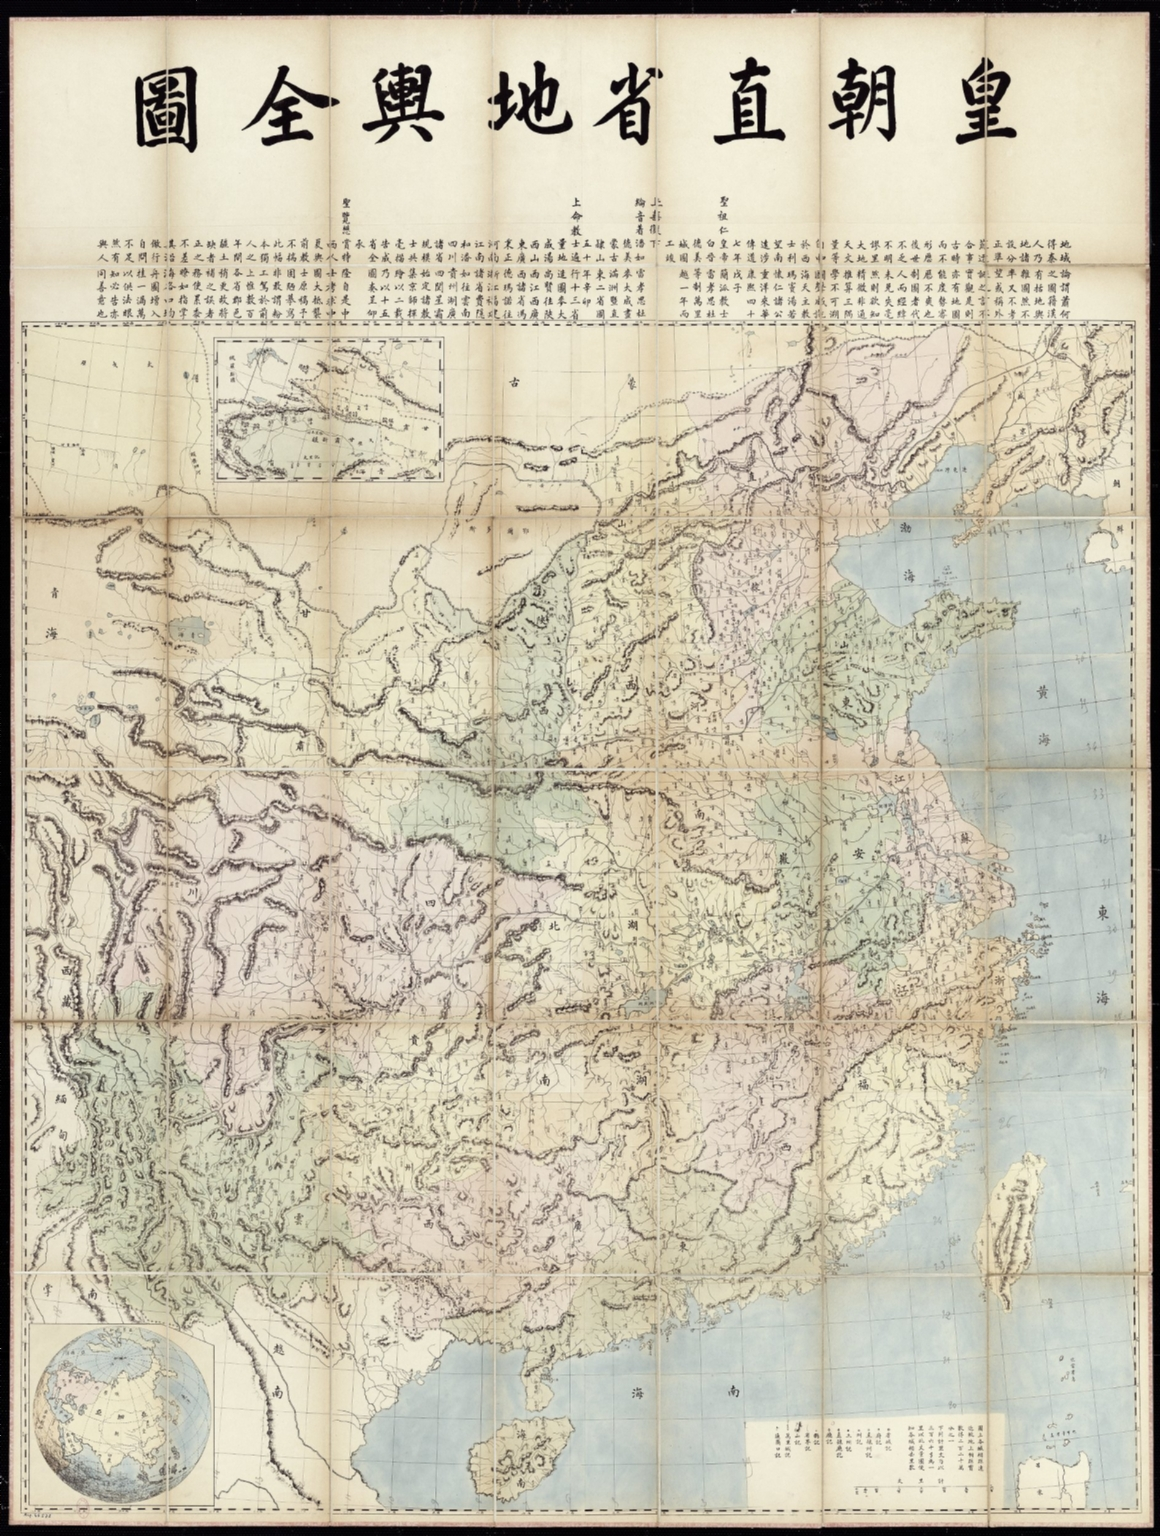 皇朝直省地輿全圖 = Carte des provinces de la Chine